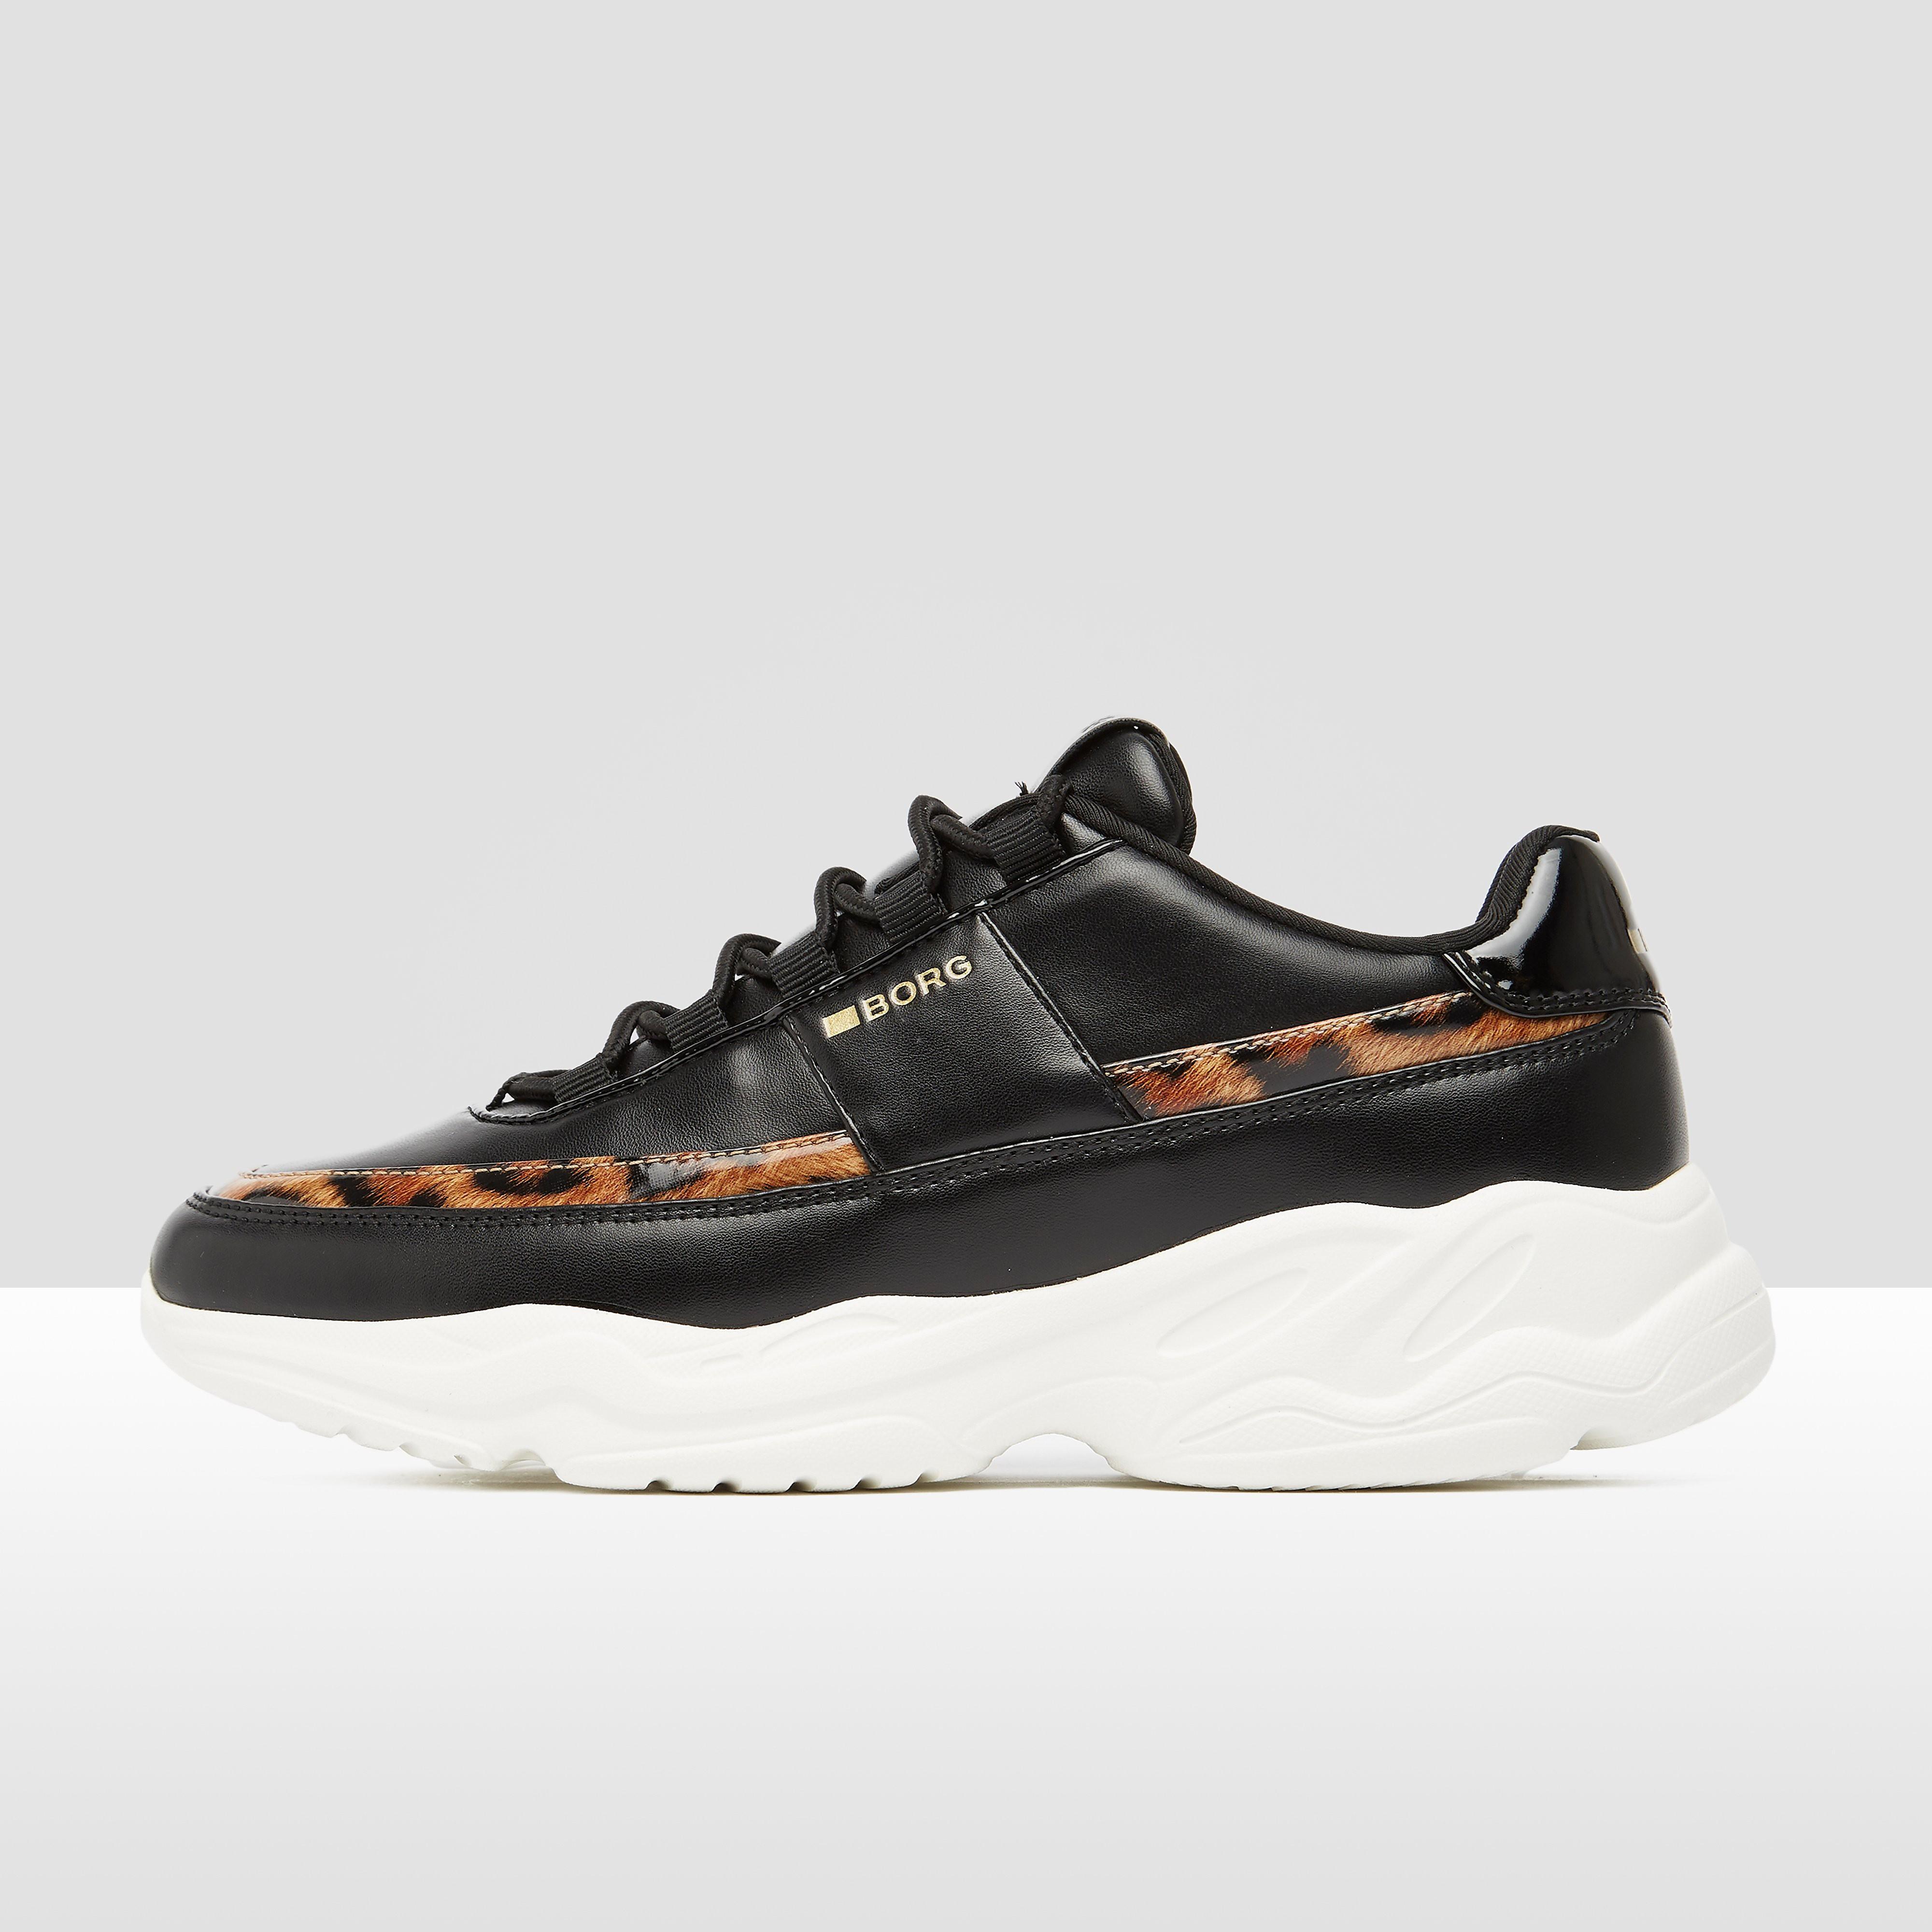 BJORN BORG X310 low sneakers zwart dames Dames